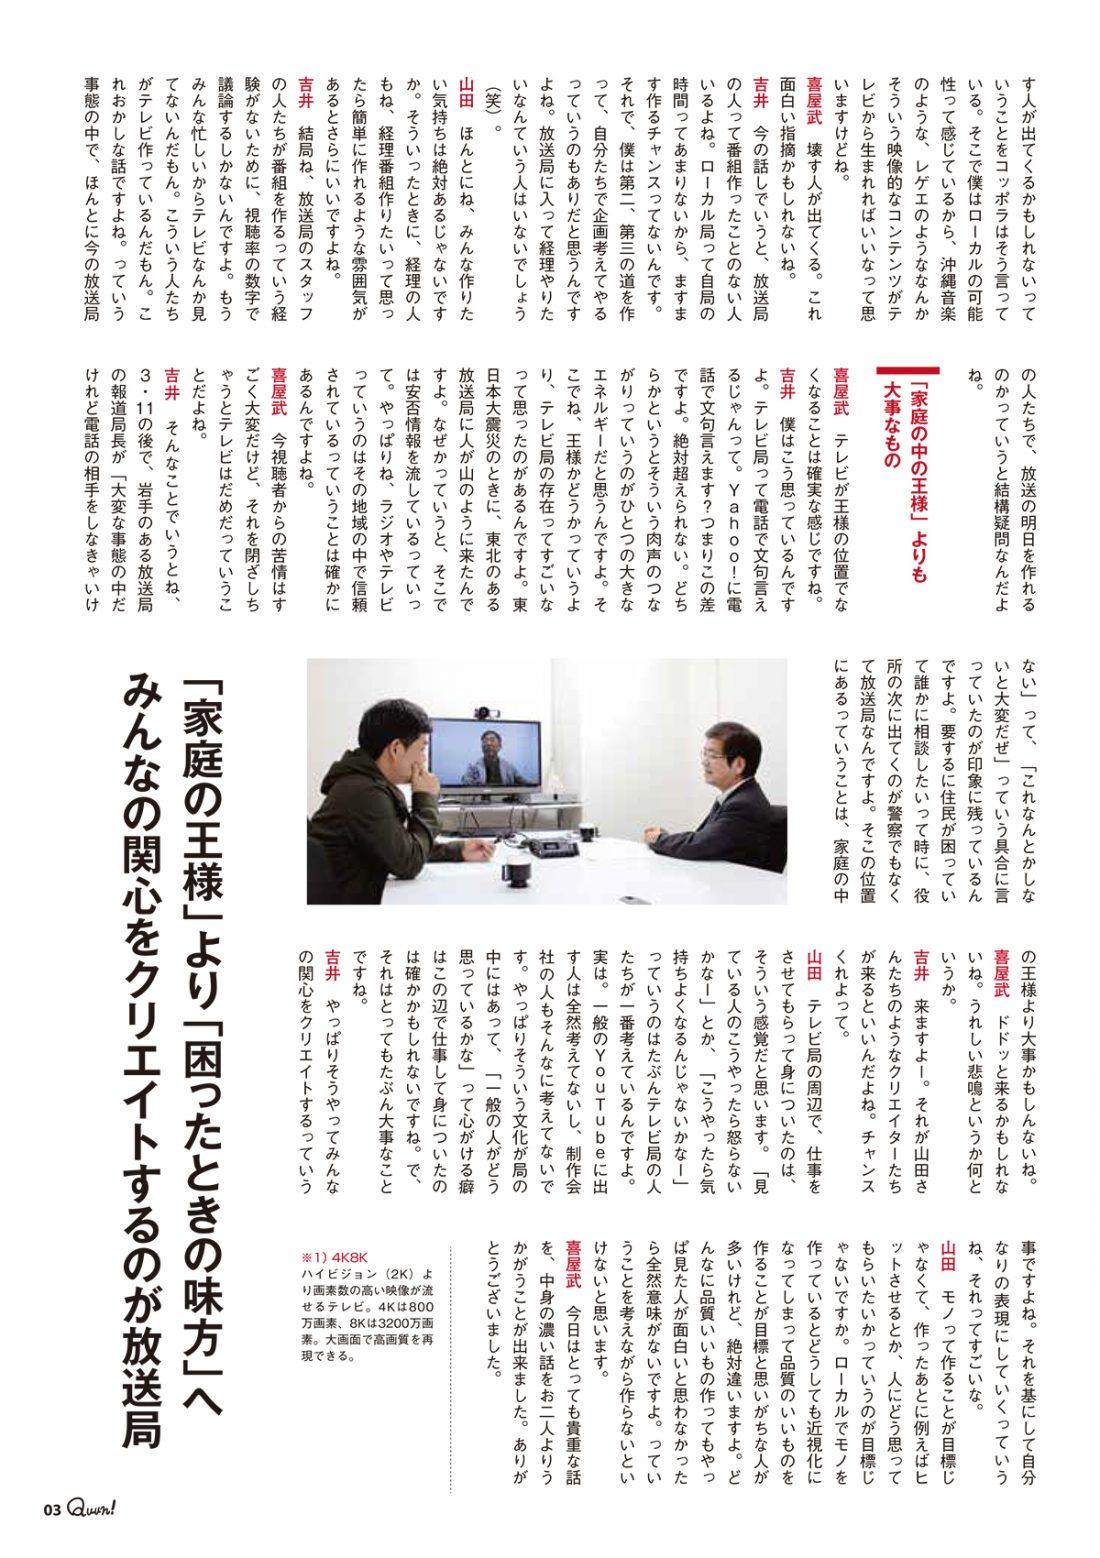 https://www.qab.co.jp/qgoro/wp-content/uploads/quun_0205-1100x1558.jpg